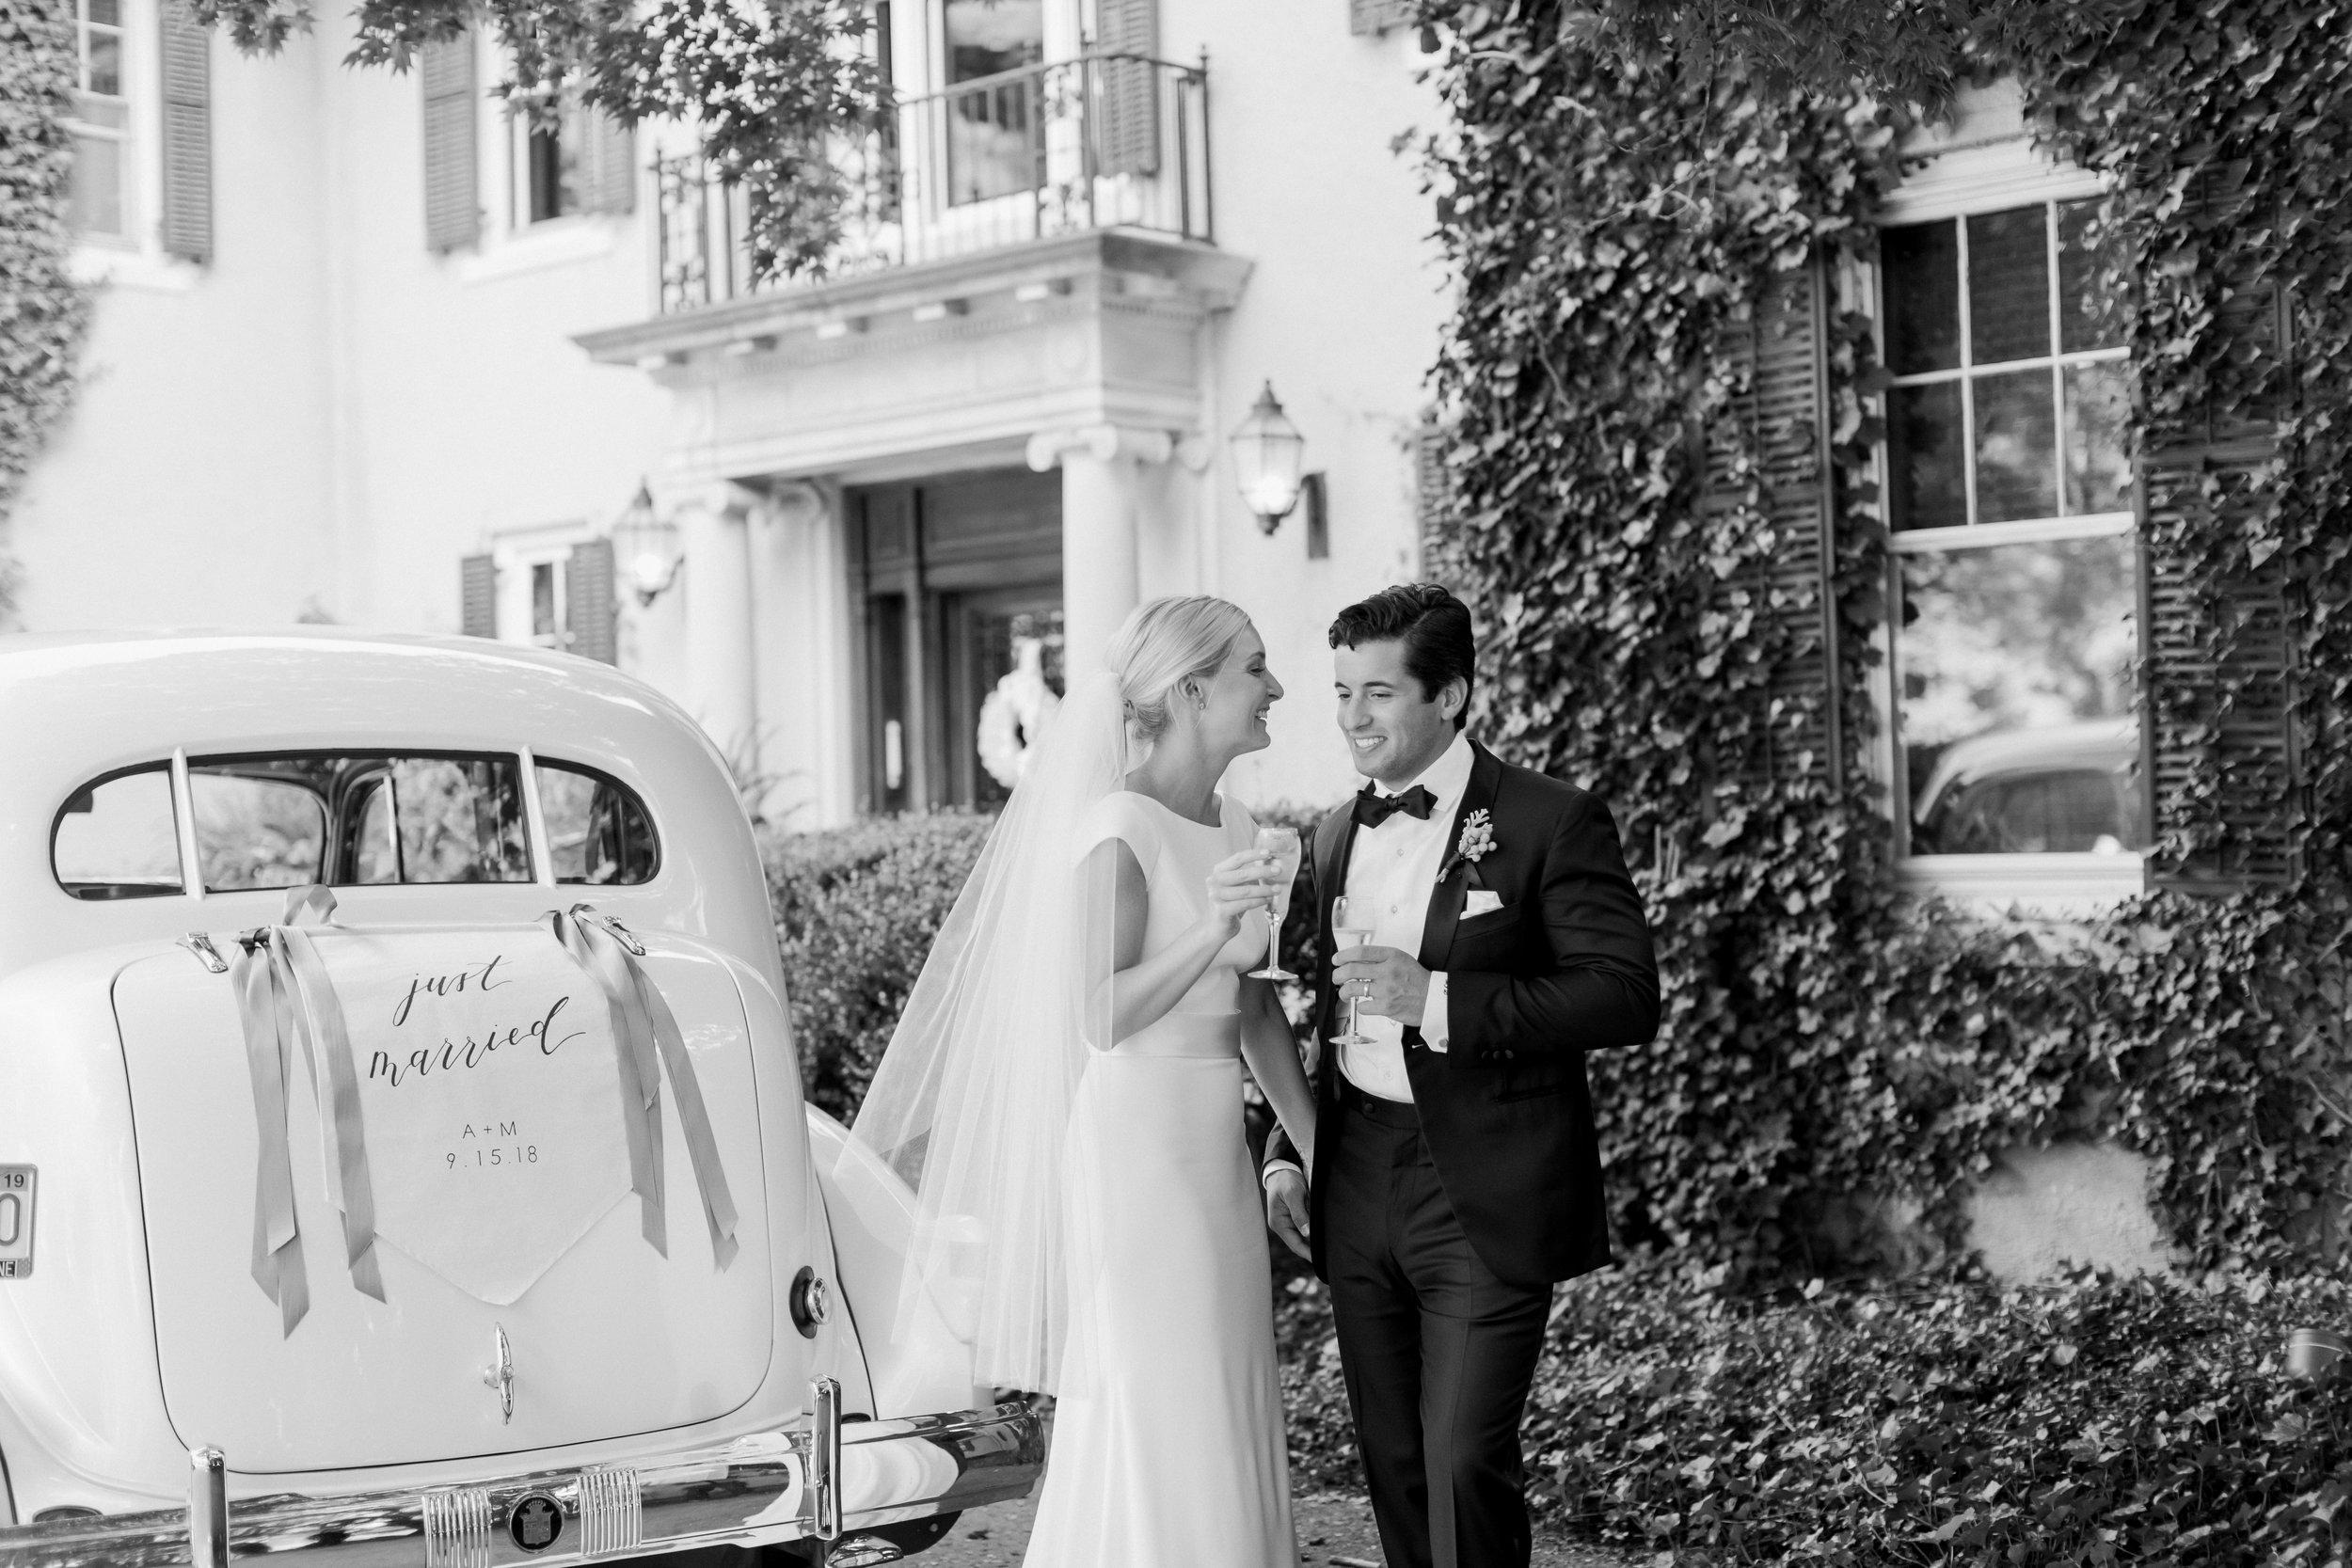 wedding photos lord thompson manor.JPG